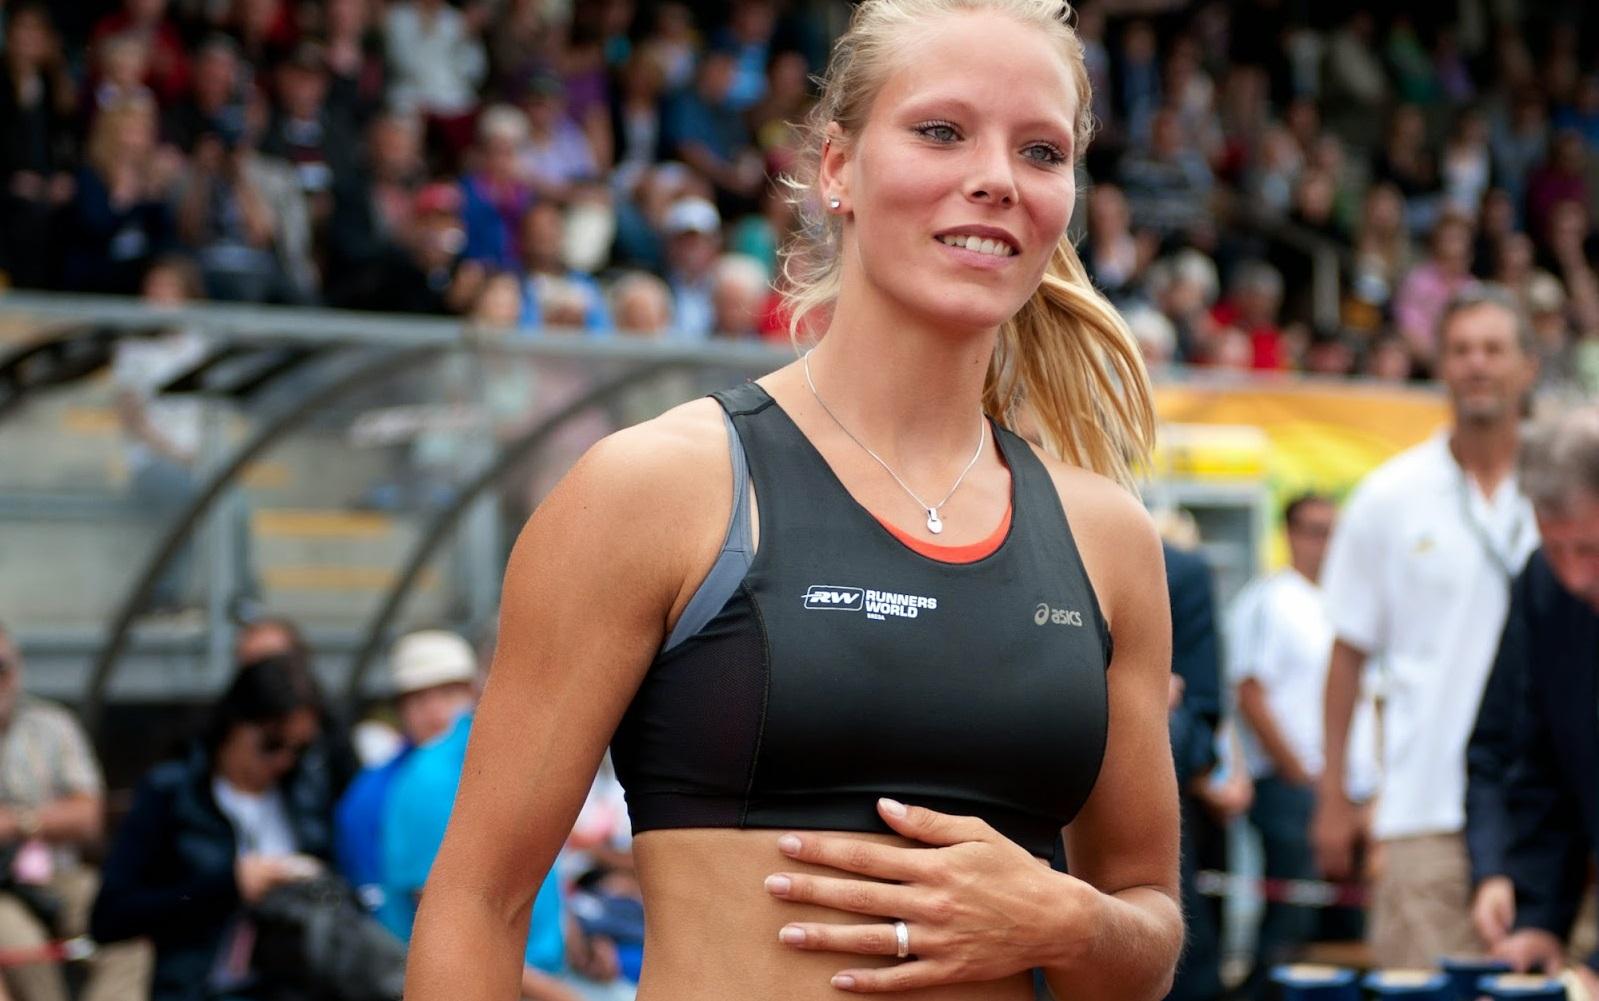 Nadine Broersen